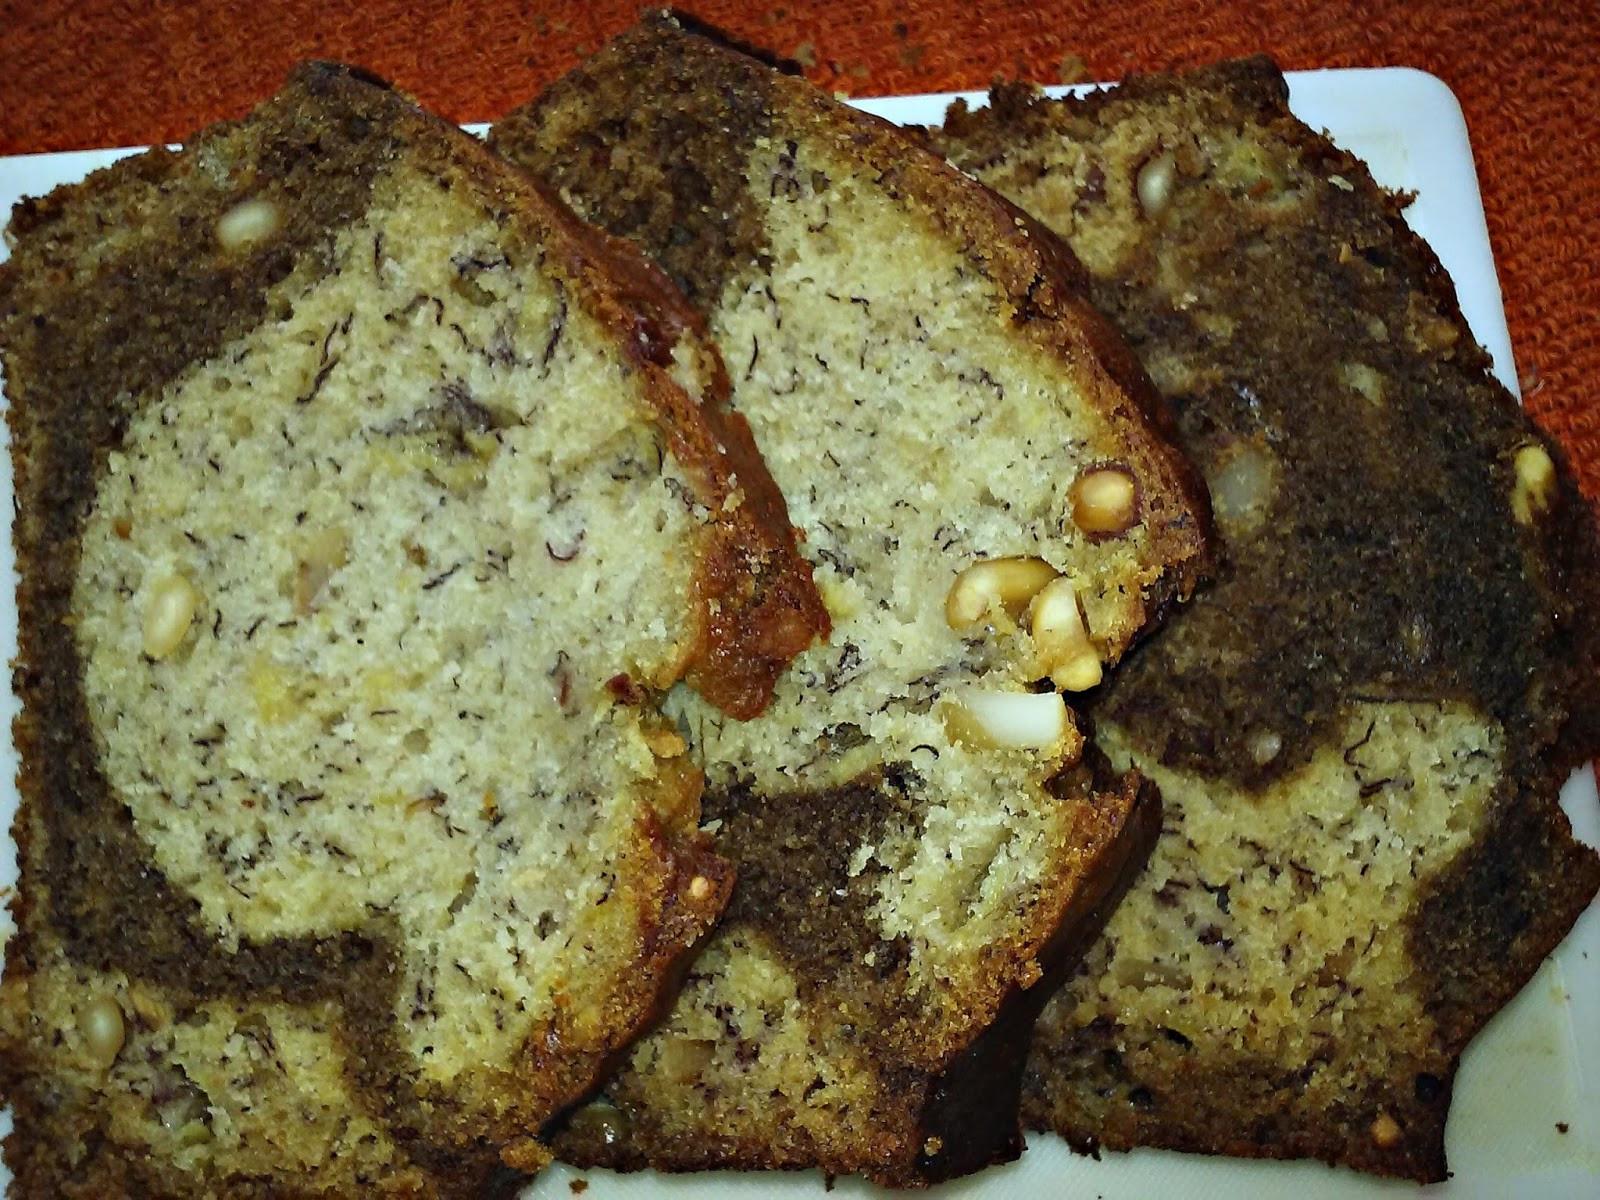 Banana Bread Alton Brown  Passion Kneaded Coffee Spiked Banana Cashew Bread